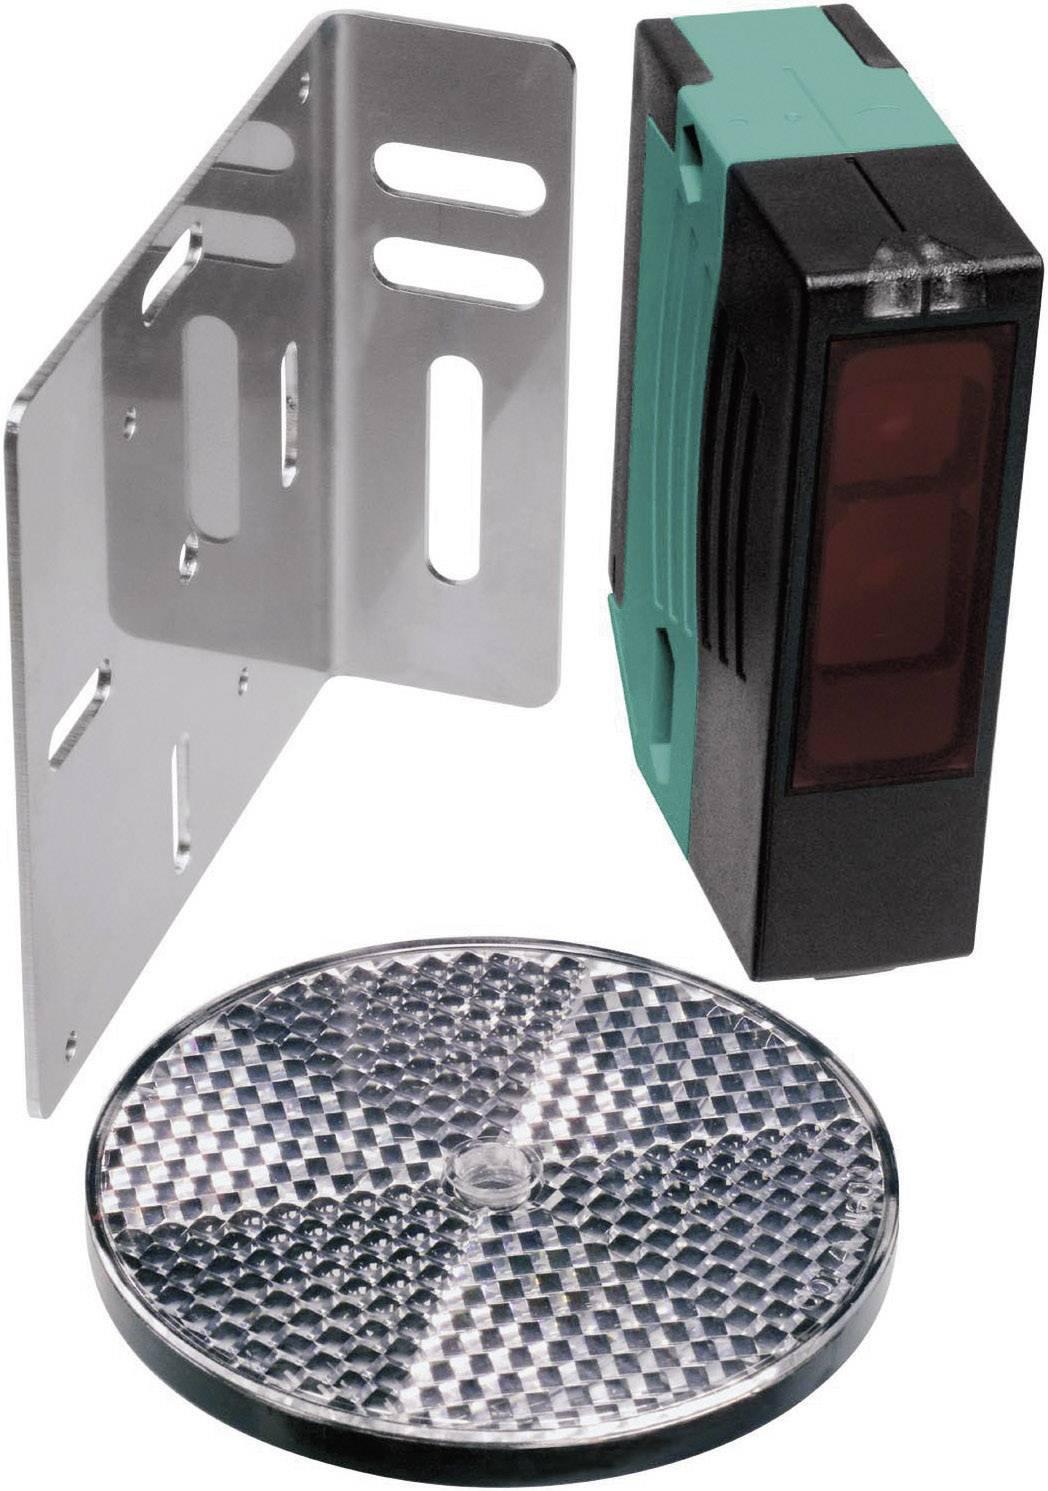 Reflexná svetelná závora Pepperl & Fuchs RLK29-55/25/116-SET